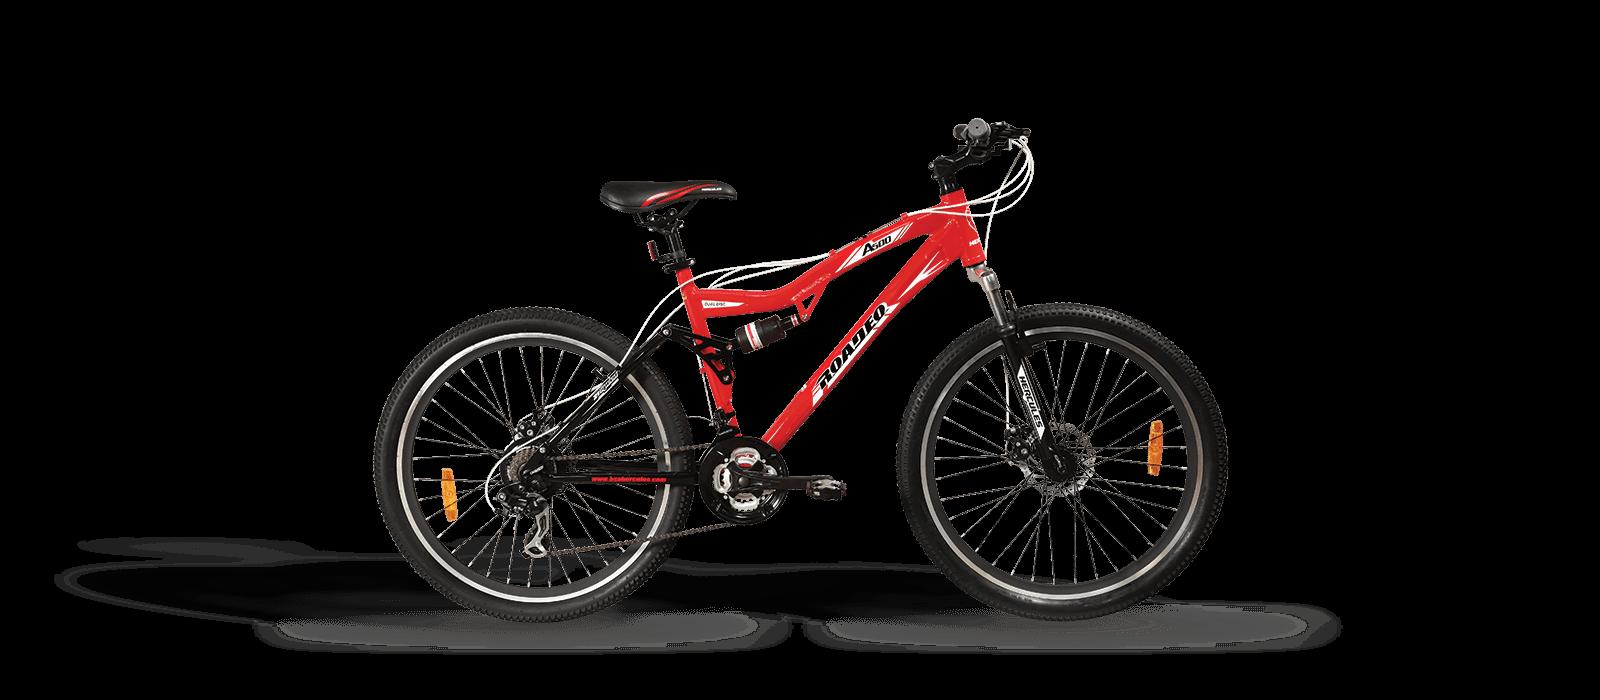 Top 10 Bicycle Brands, Top Bike Brands - BSA Hercules